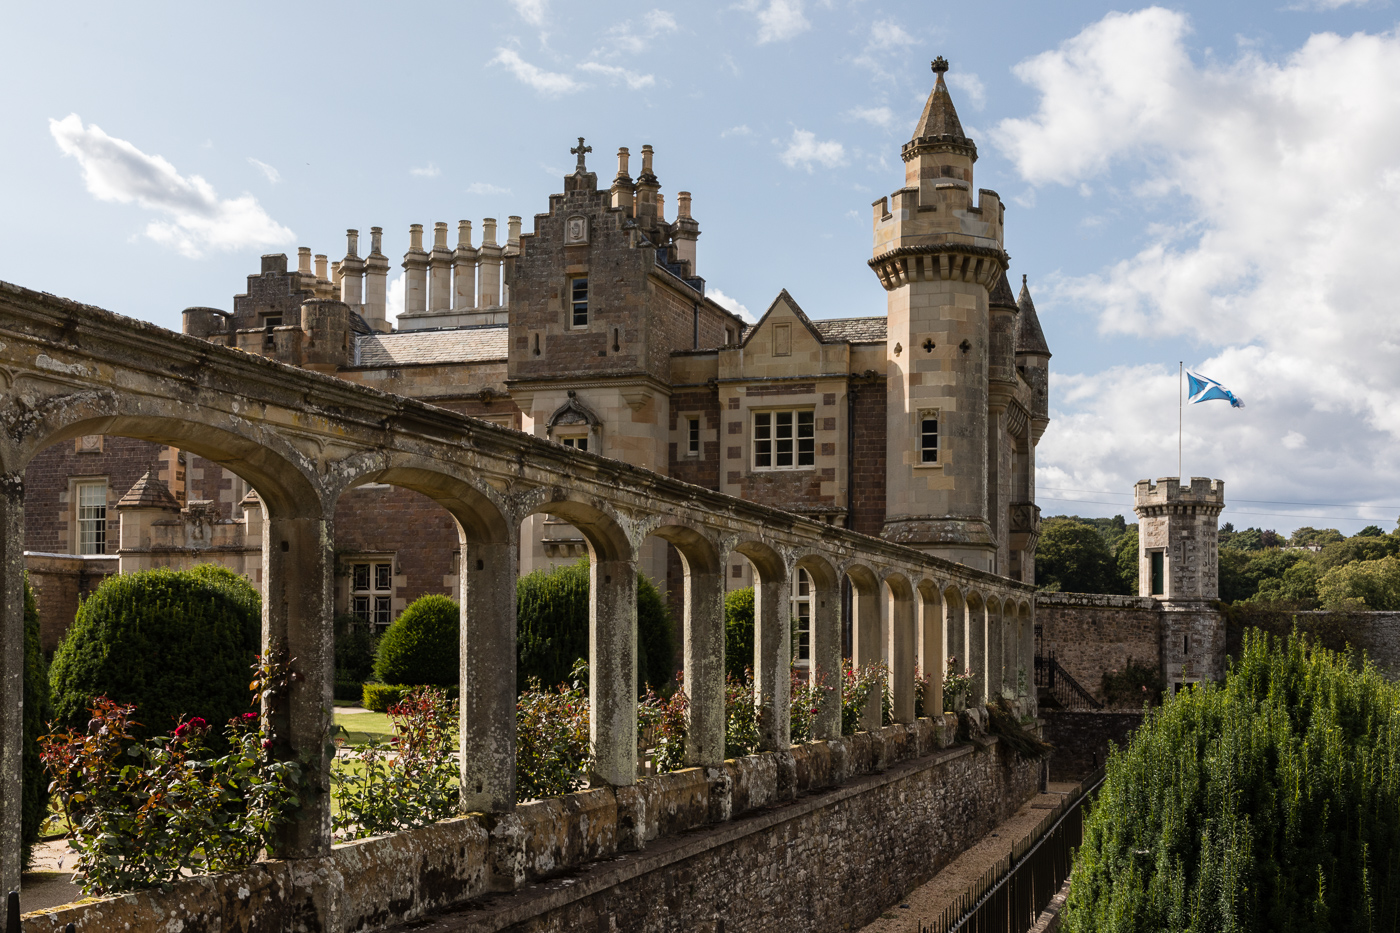 Abbotsford, home Sir Walter Scott